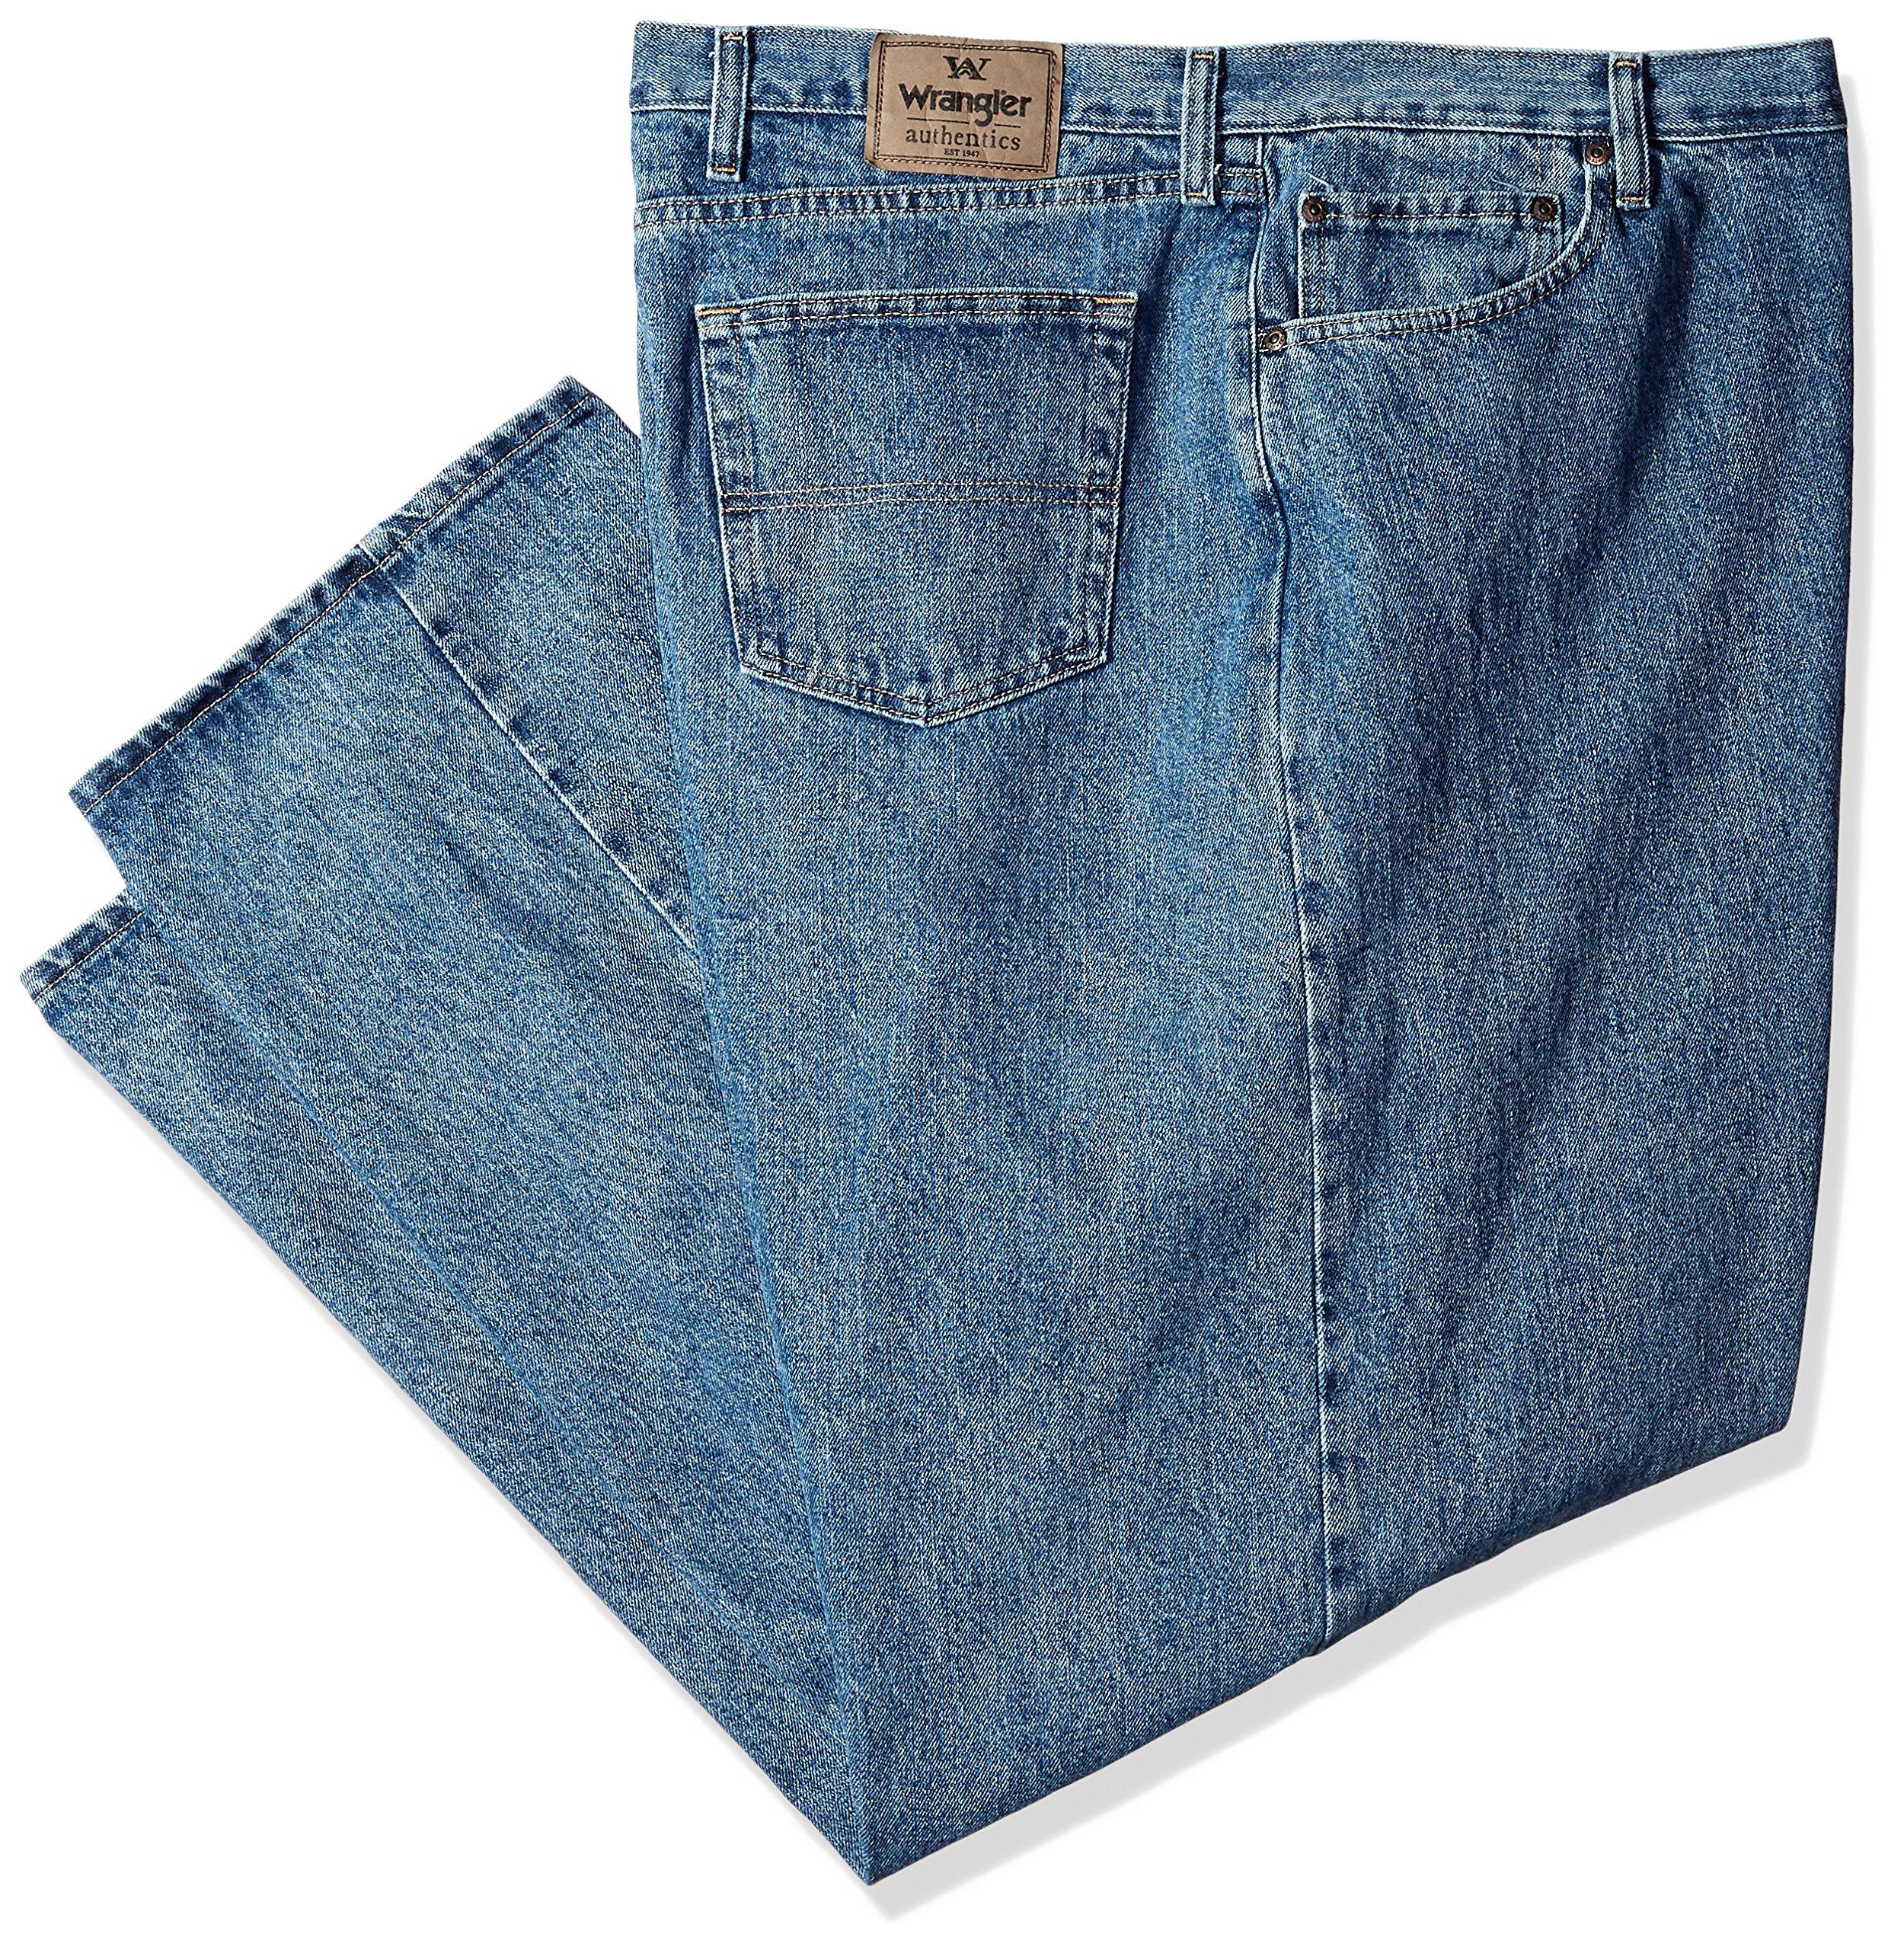 Wrangler Authentics Men's Classic Relaxed Fit Jean, Vintage Stonewash, 33x32